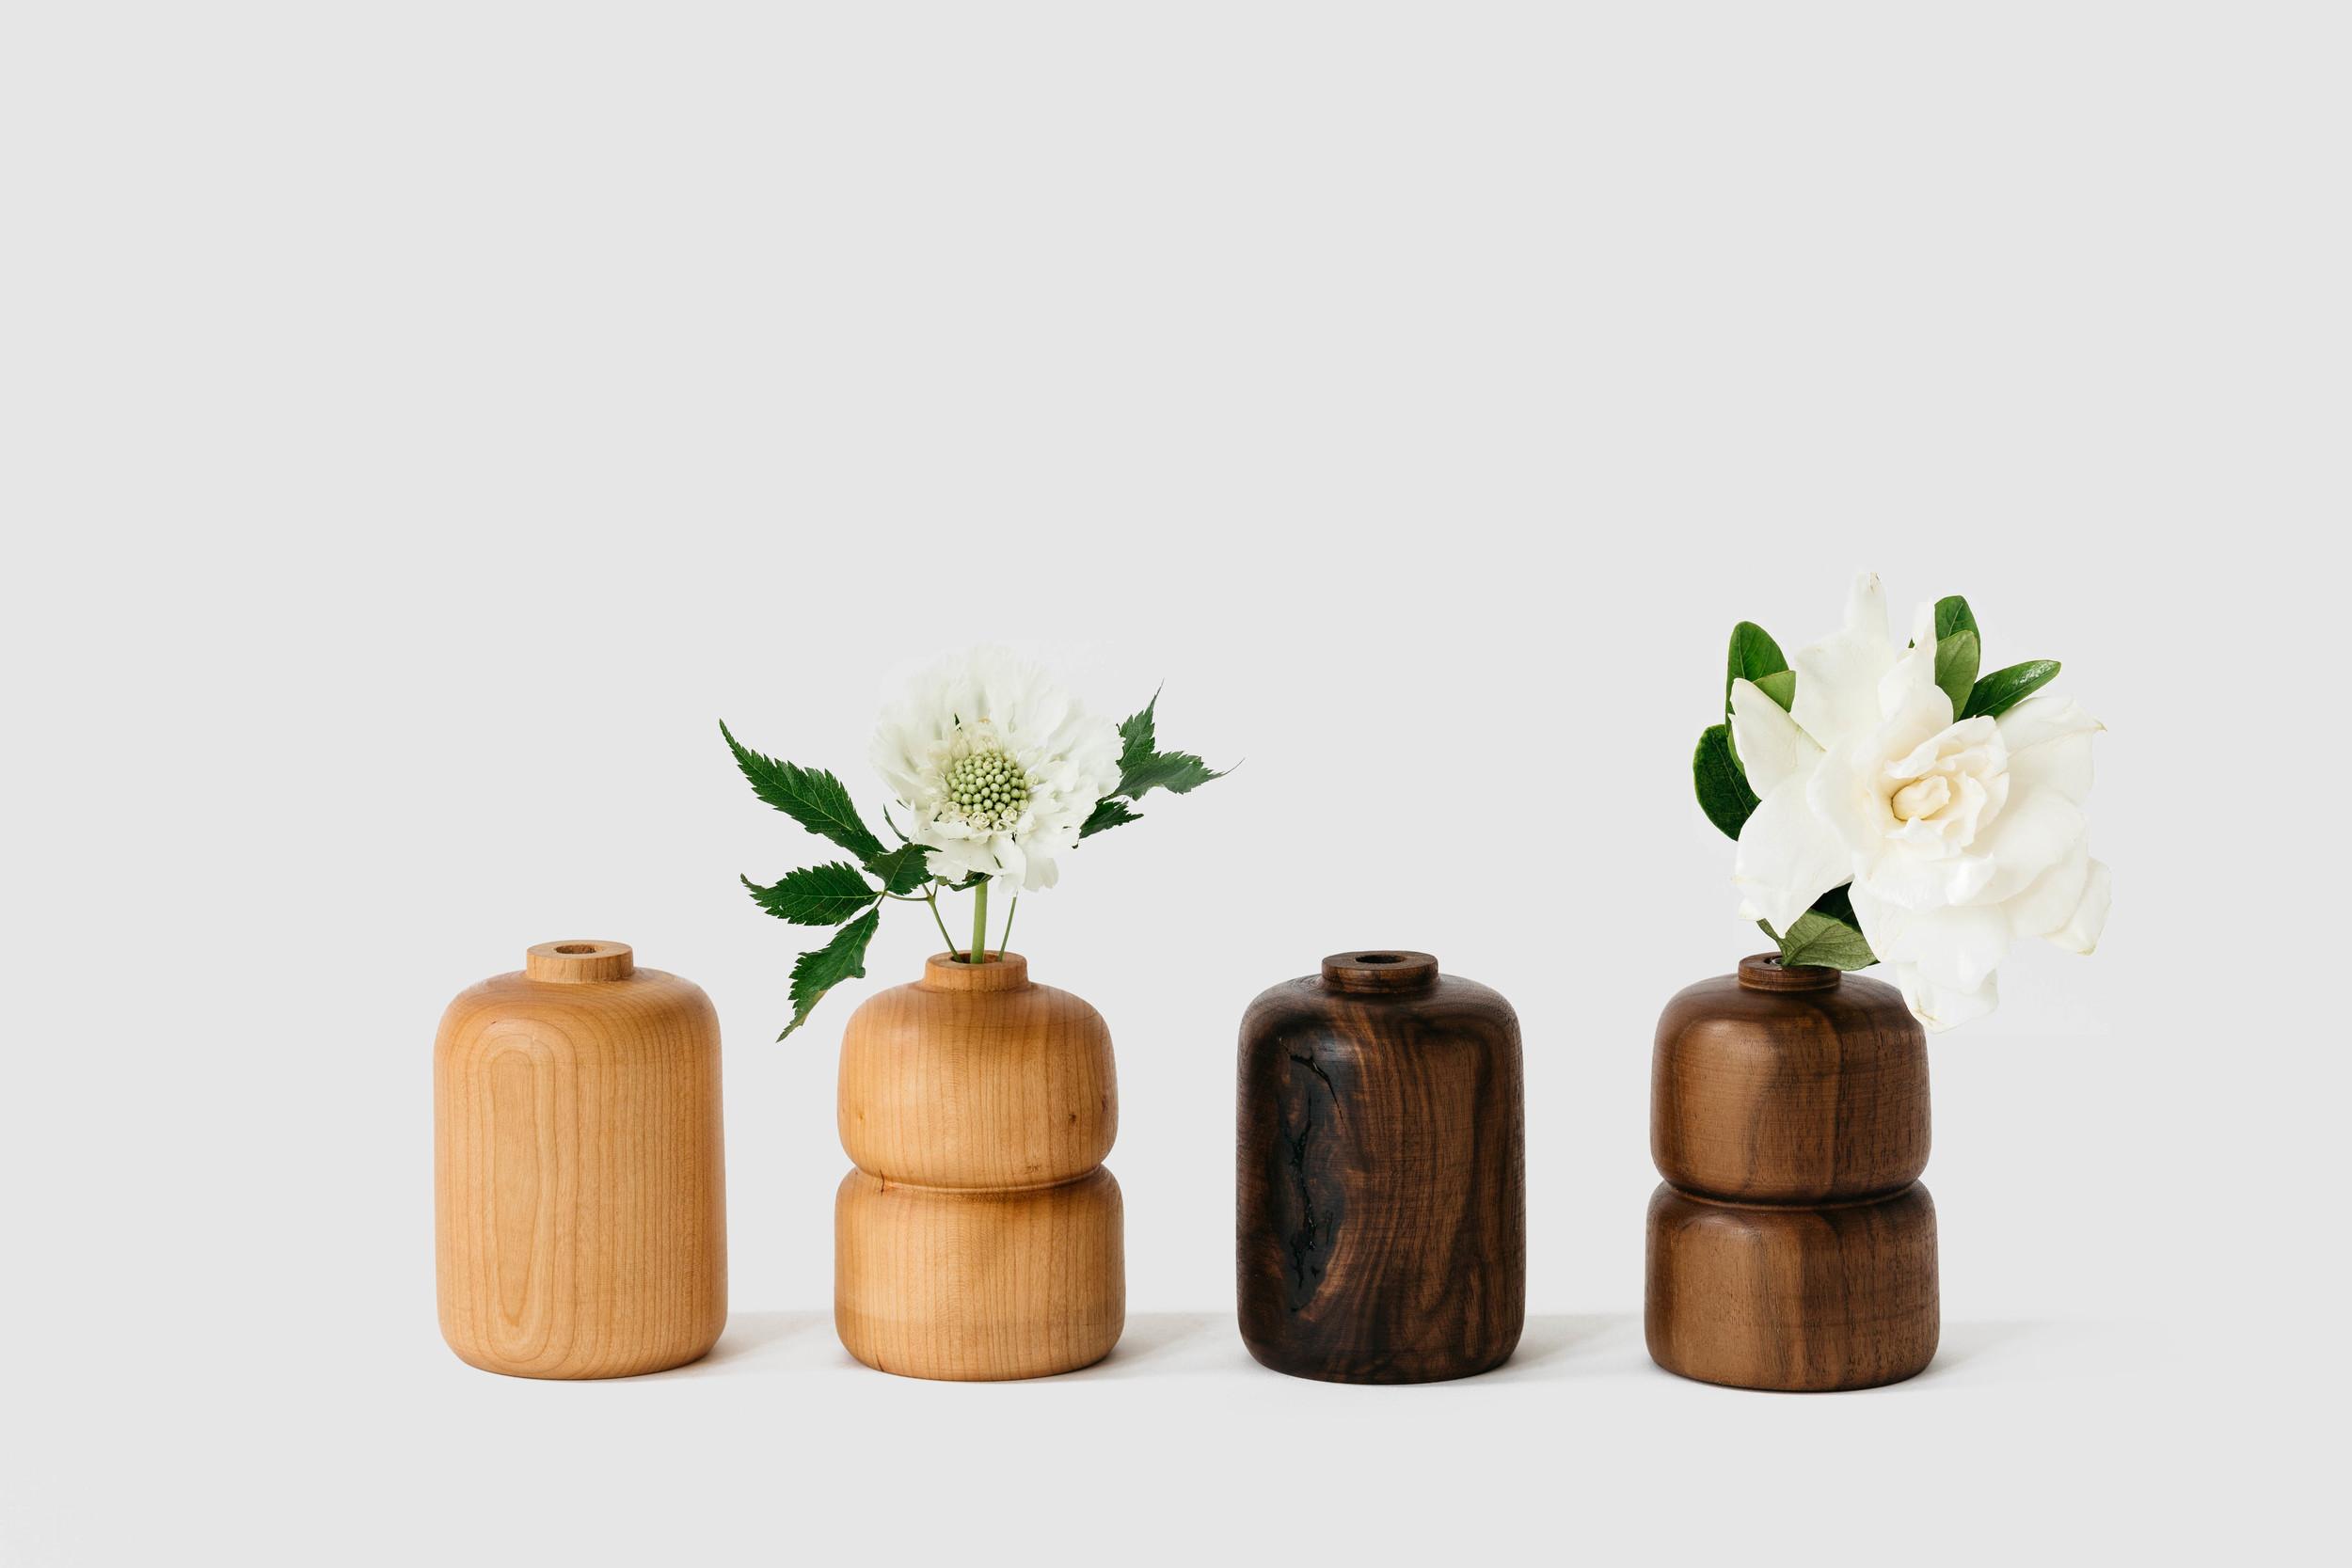 Wood bud vase melanie abrantes wood bud vase reviewsmspy